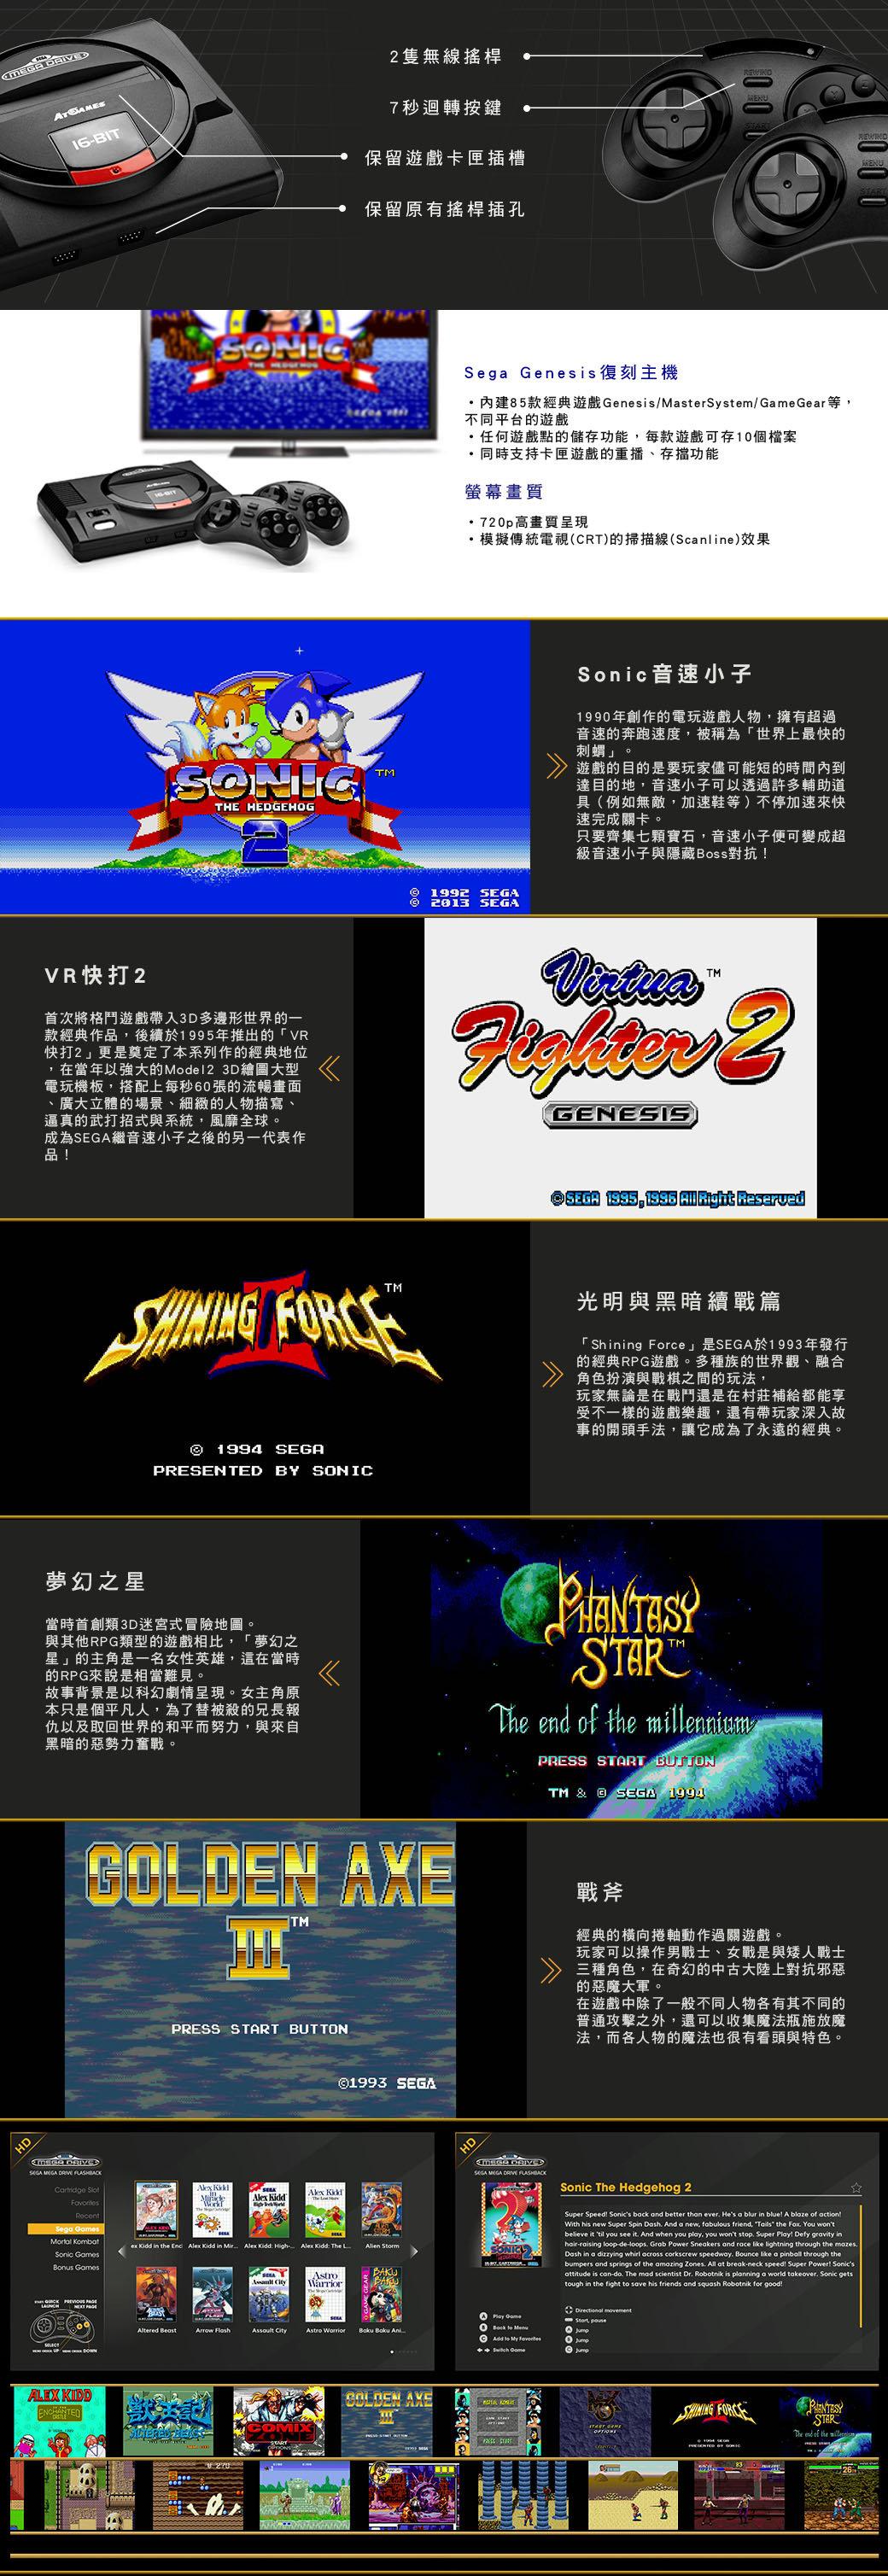 Sega | Mega Drive Flashback HD 5th Generation | HKTVmall